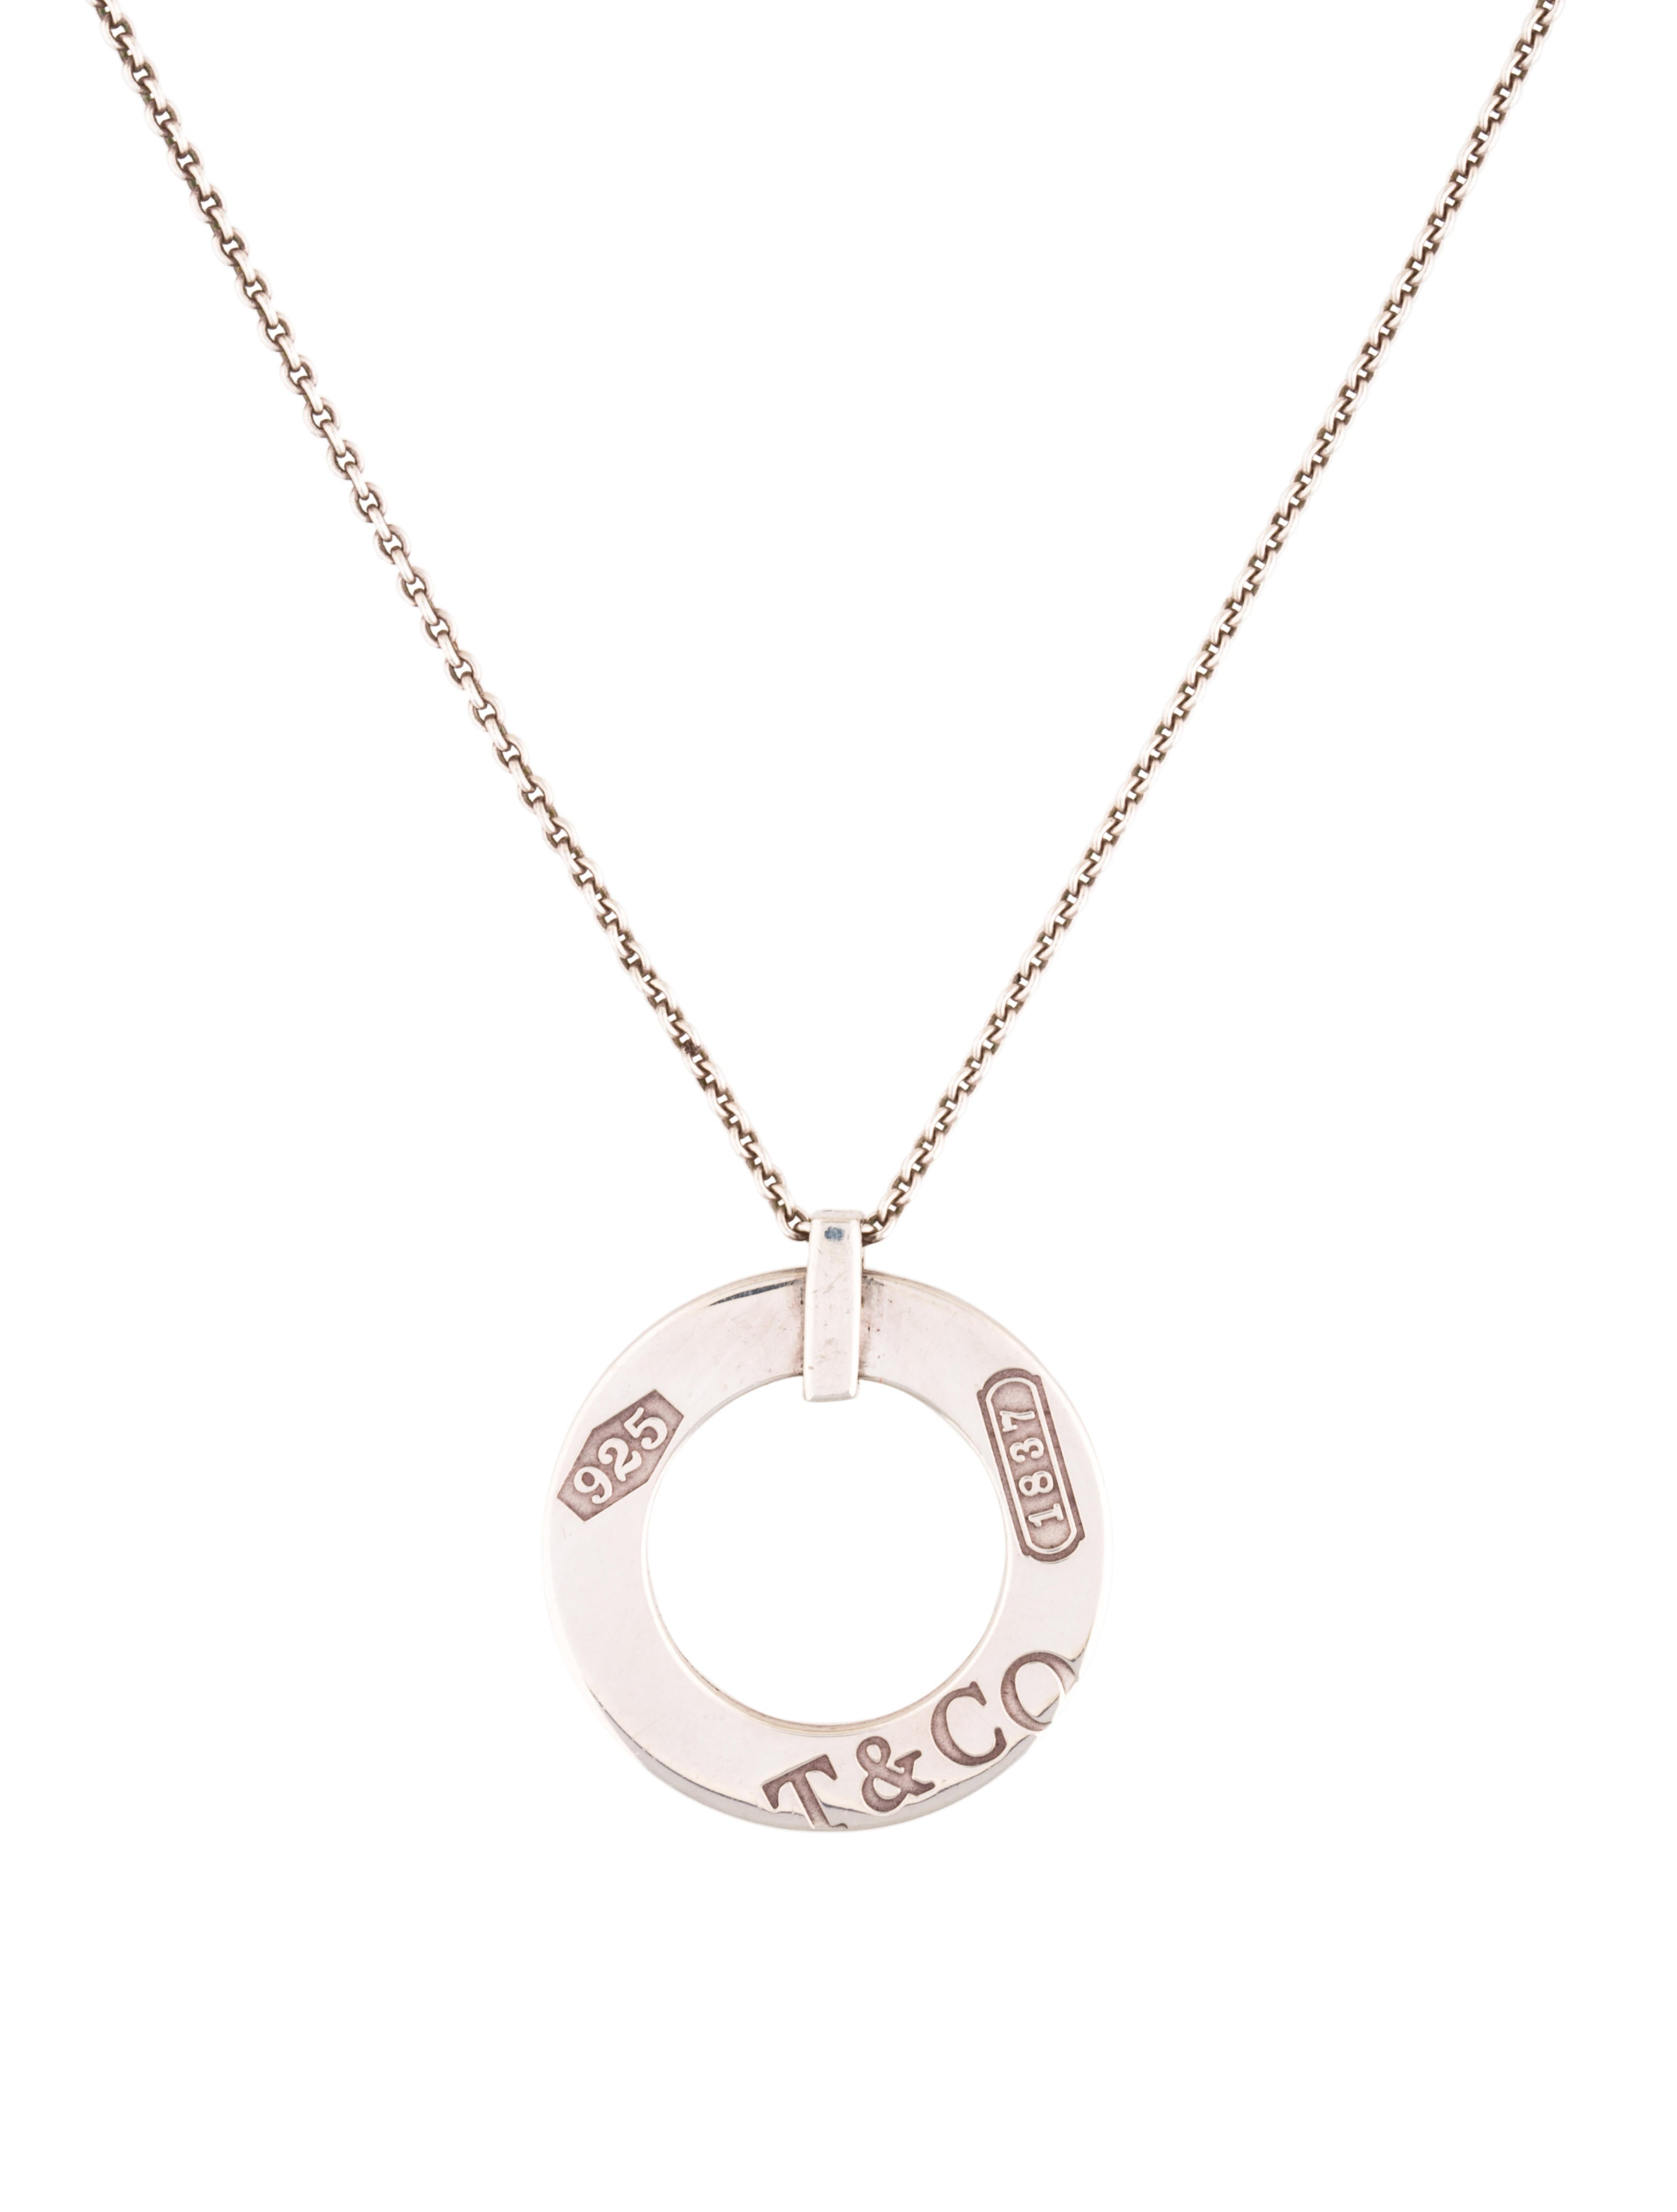 co 1837 open circle pendant necklace